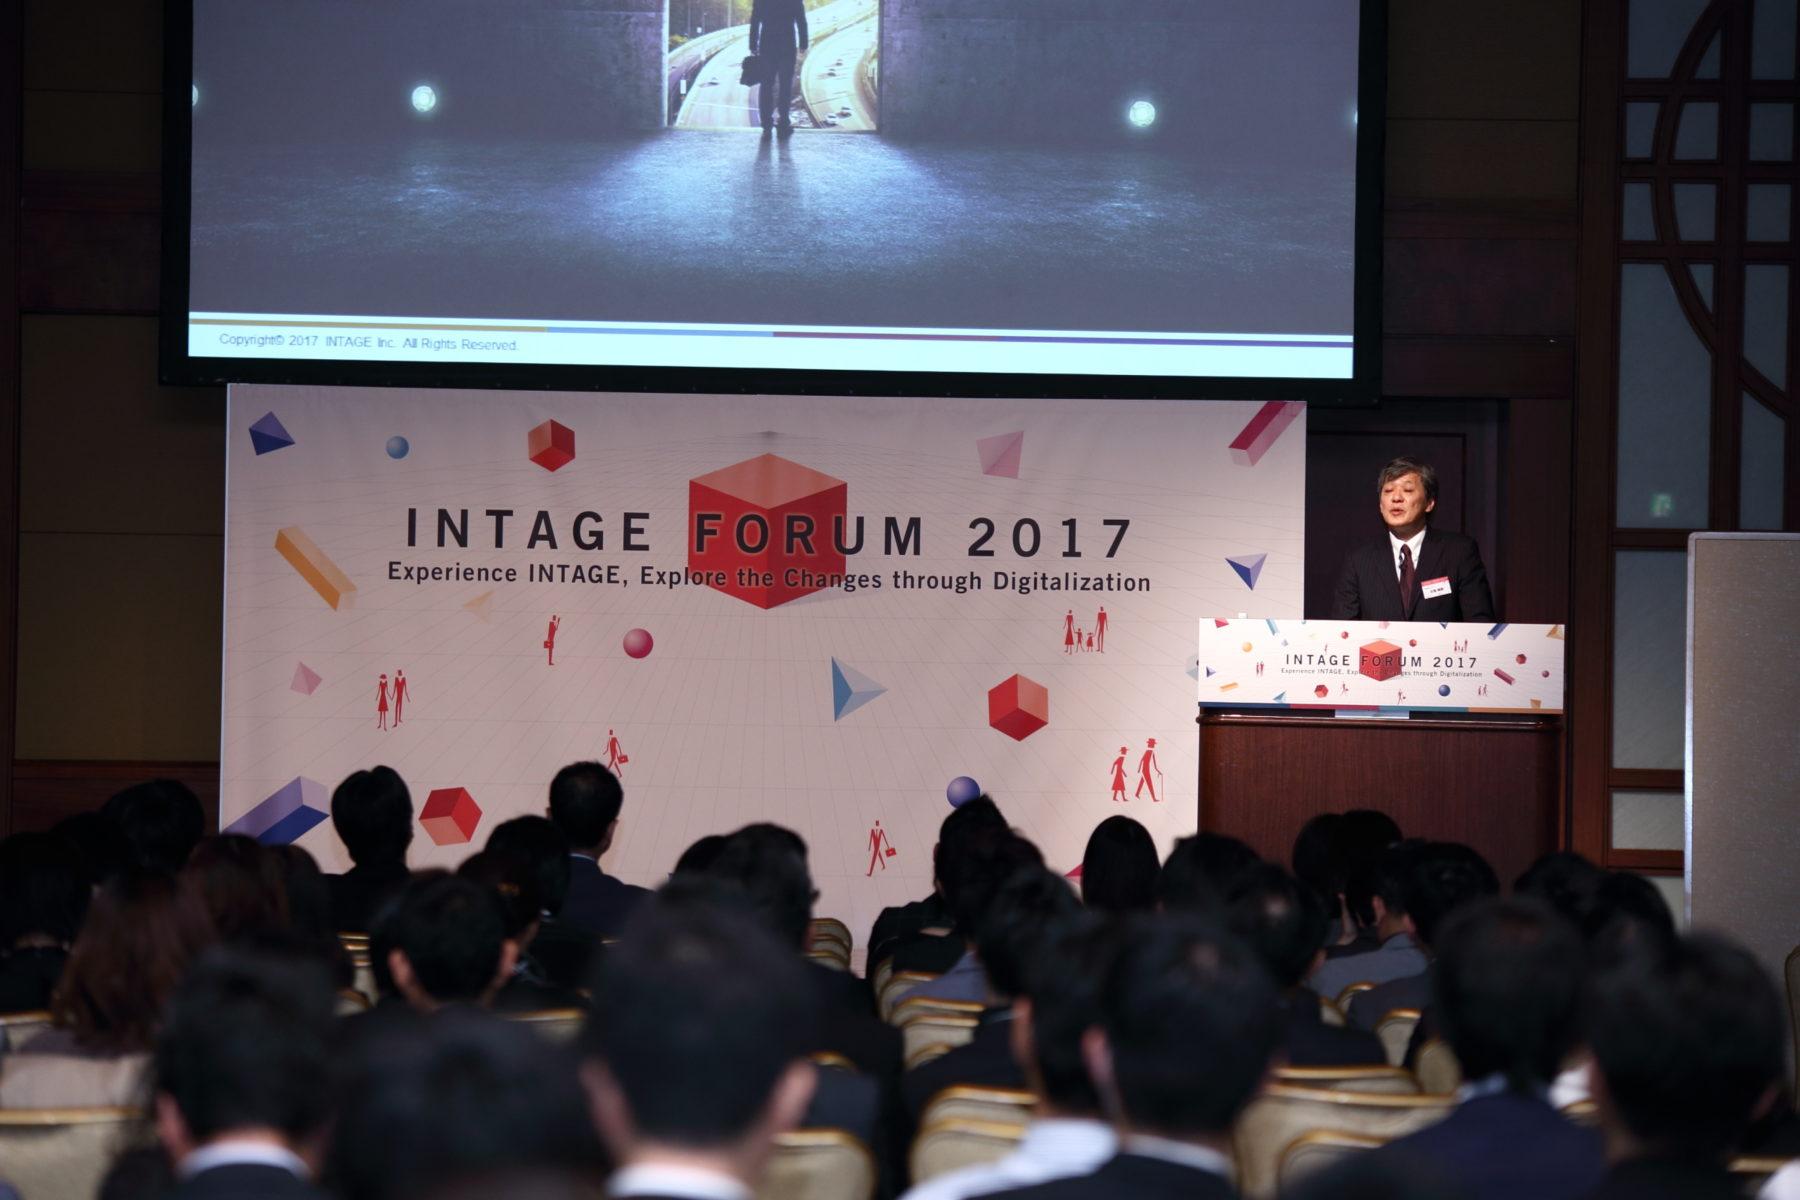 INTAGE FORUM 2017